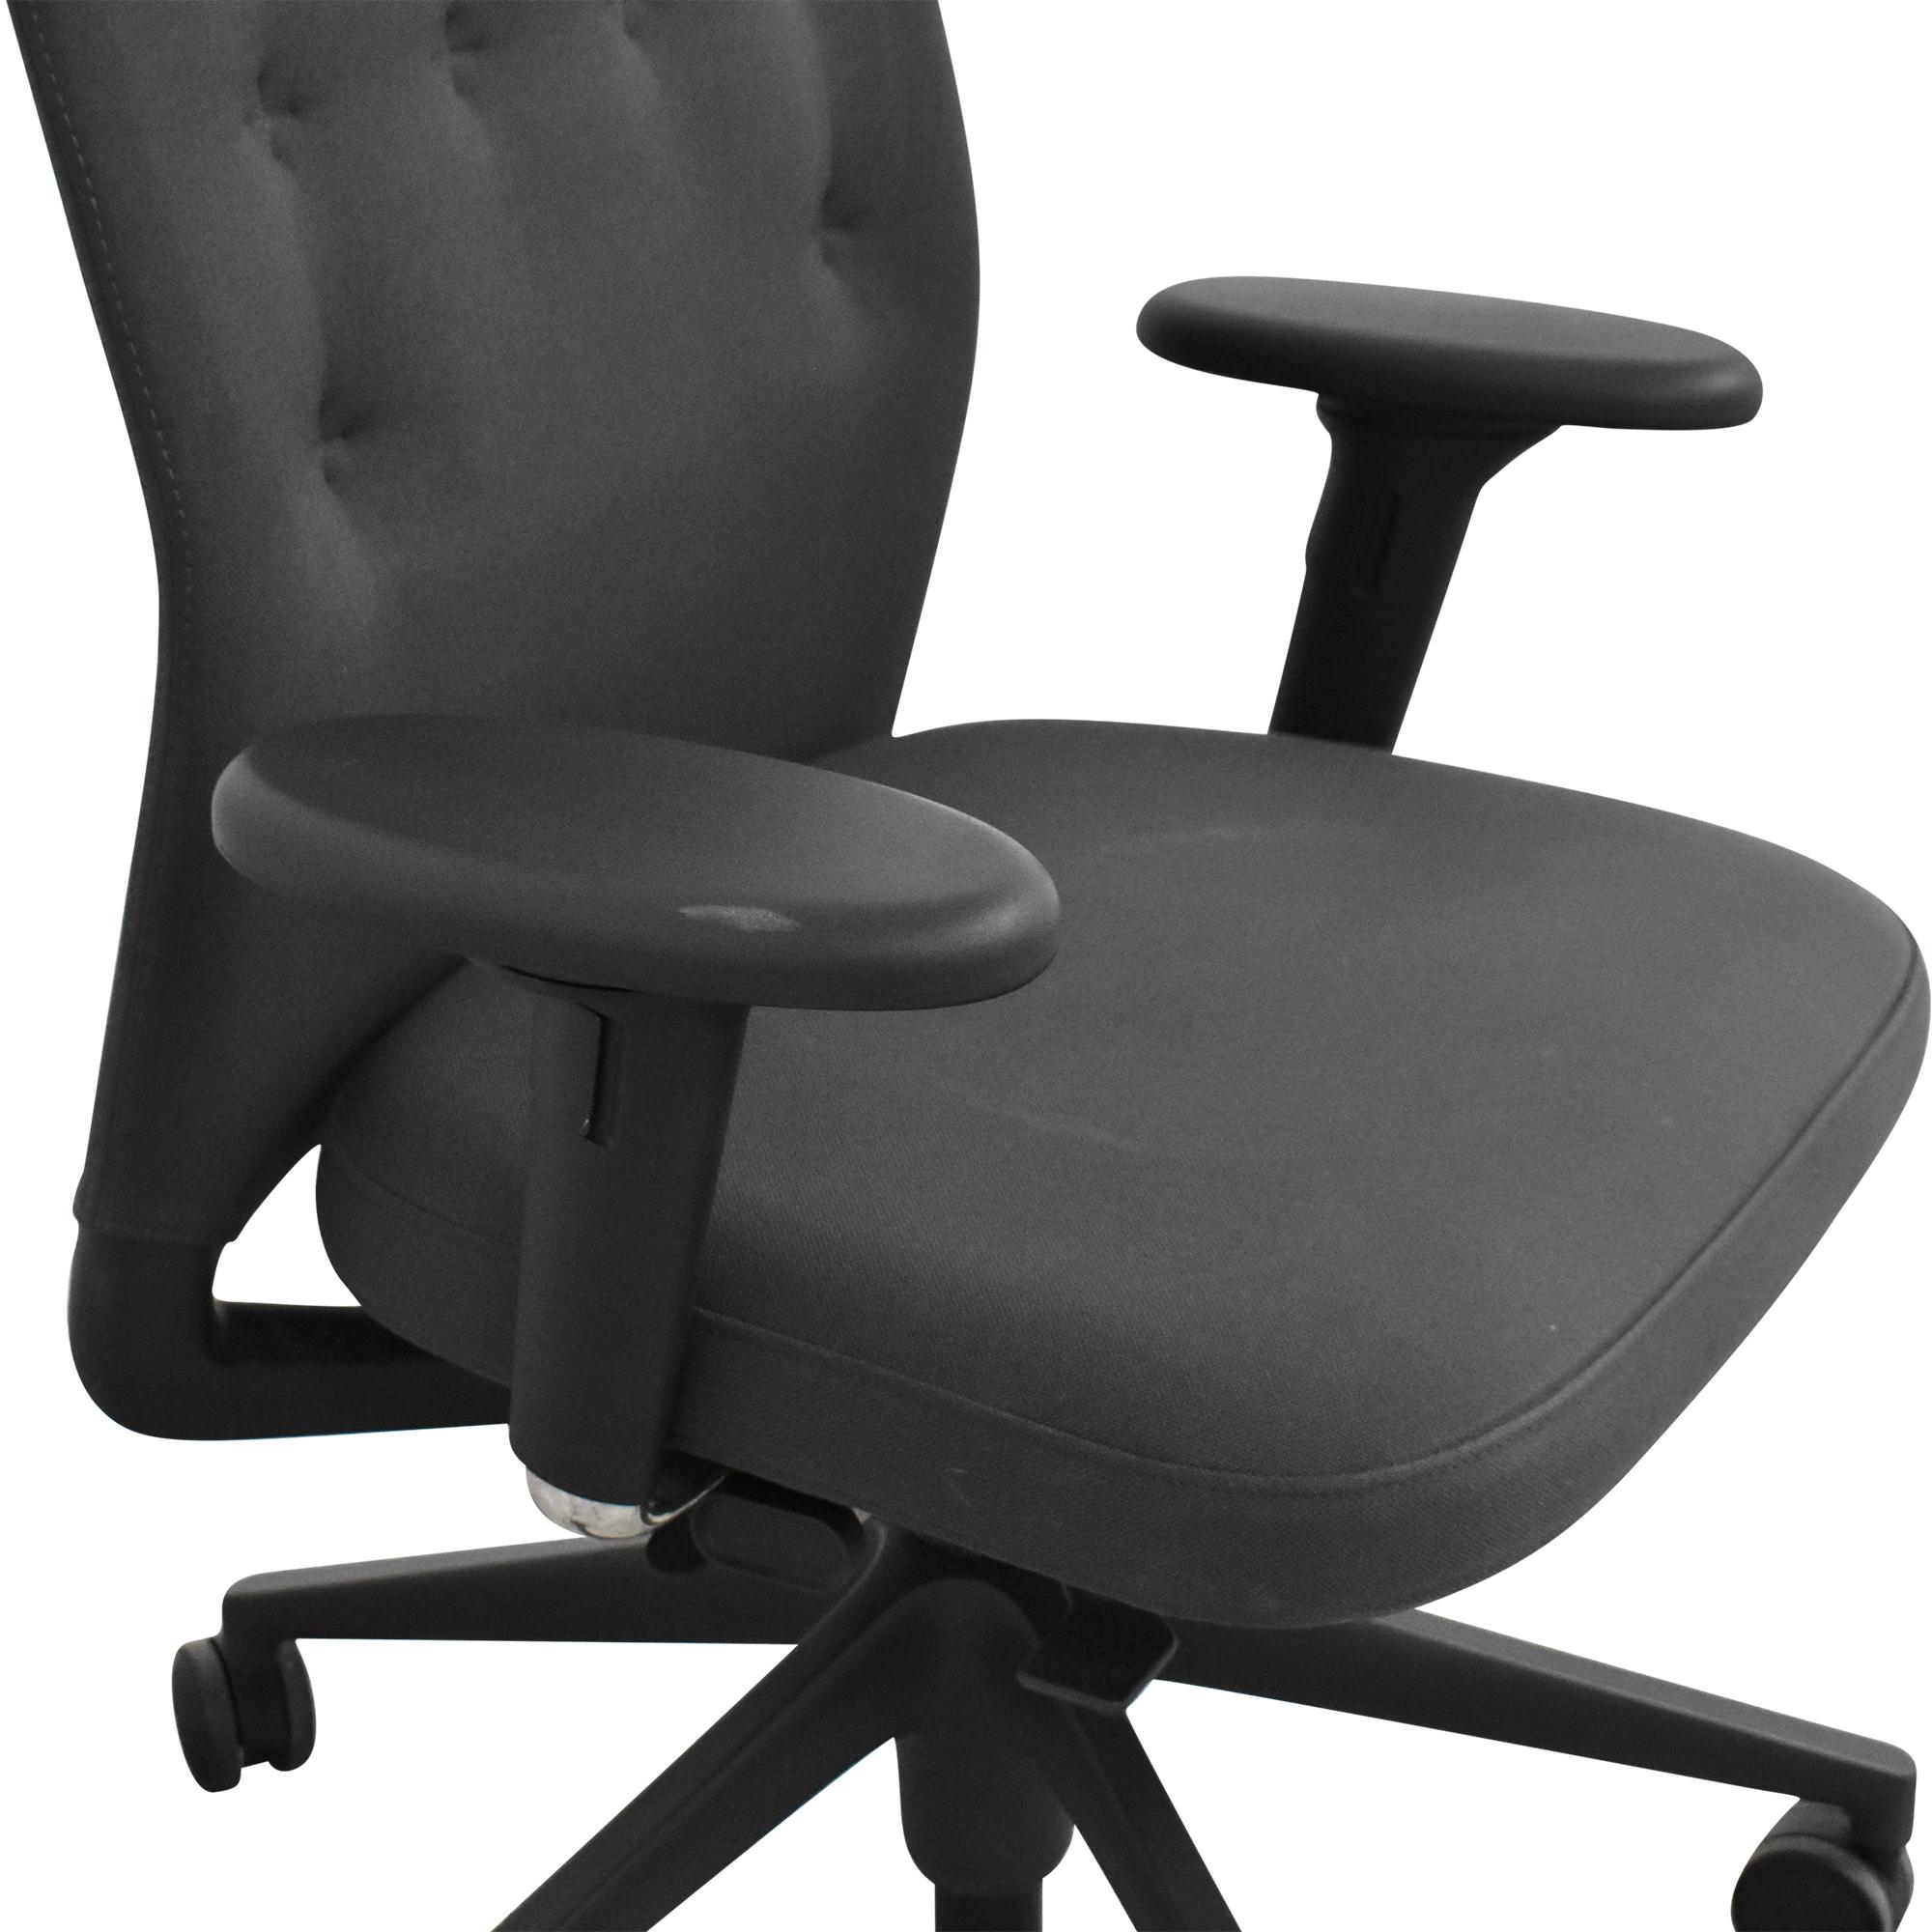 Vitra ID Trim Office Chair Vitra